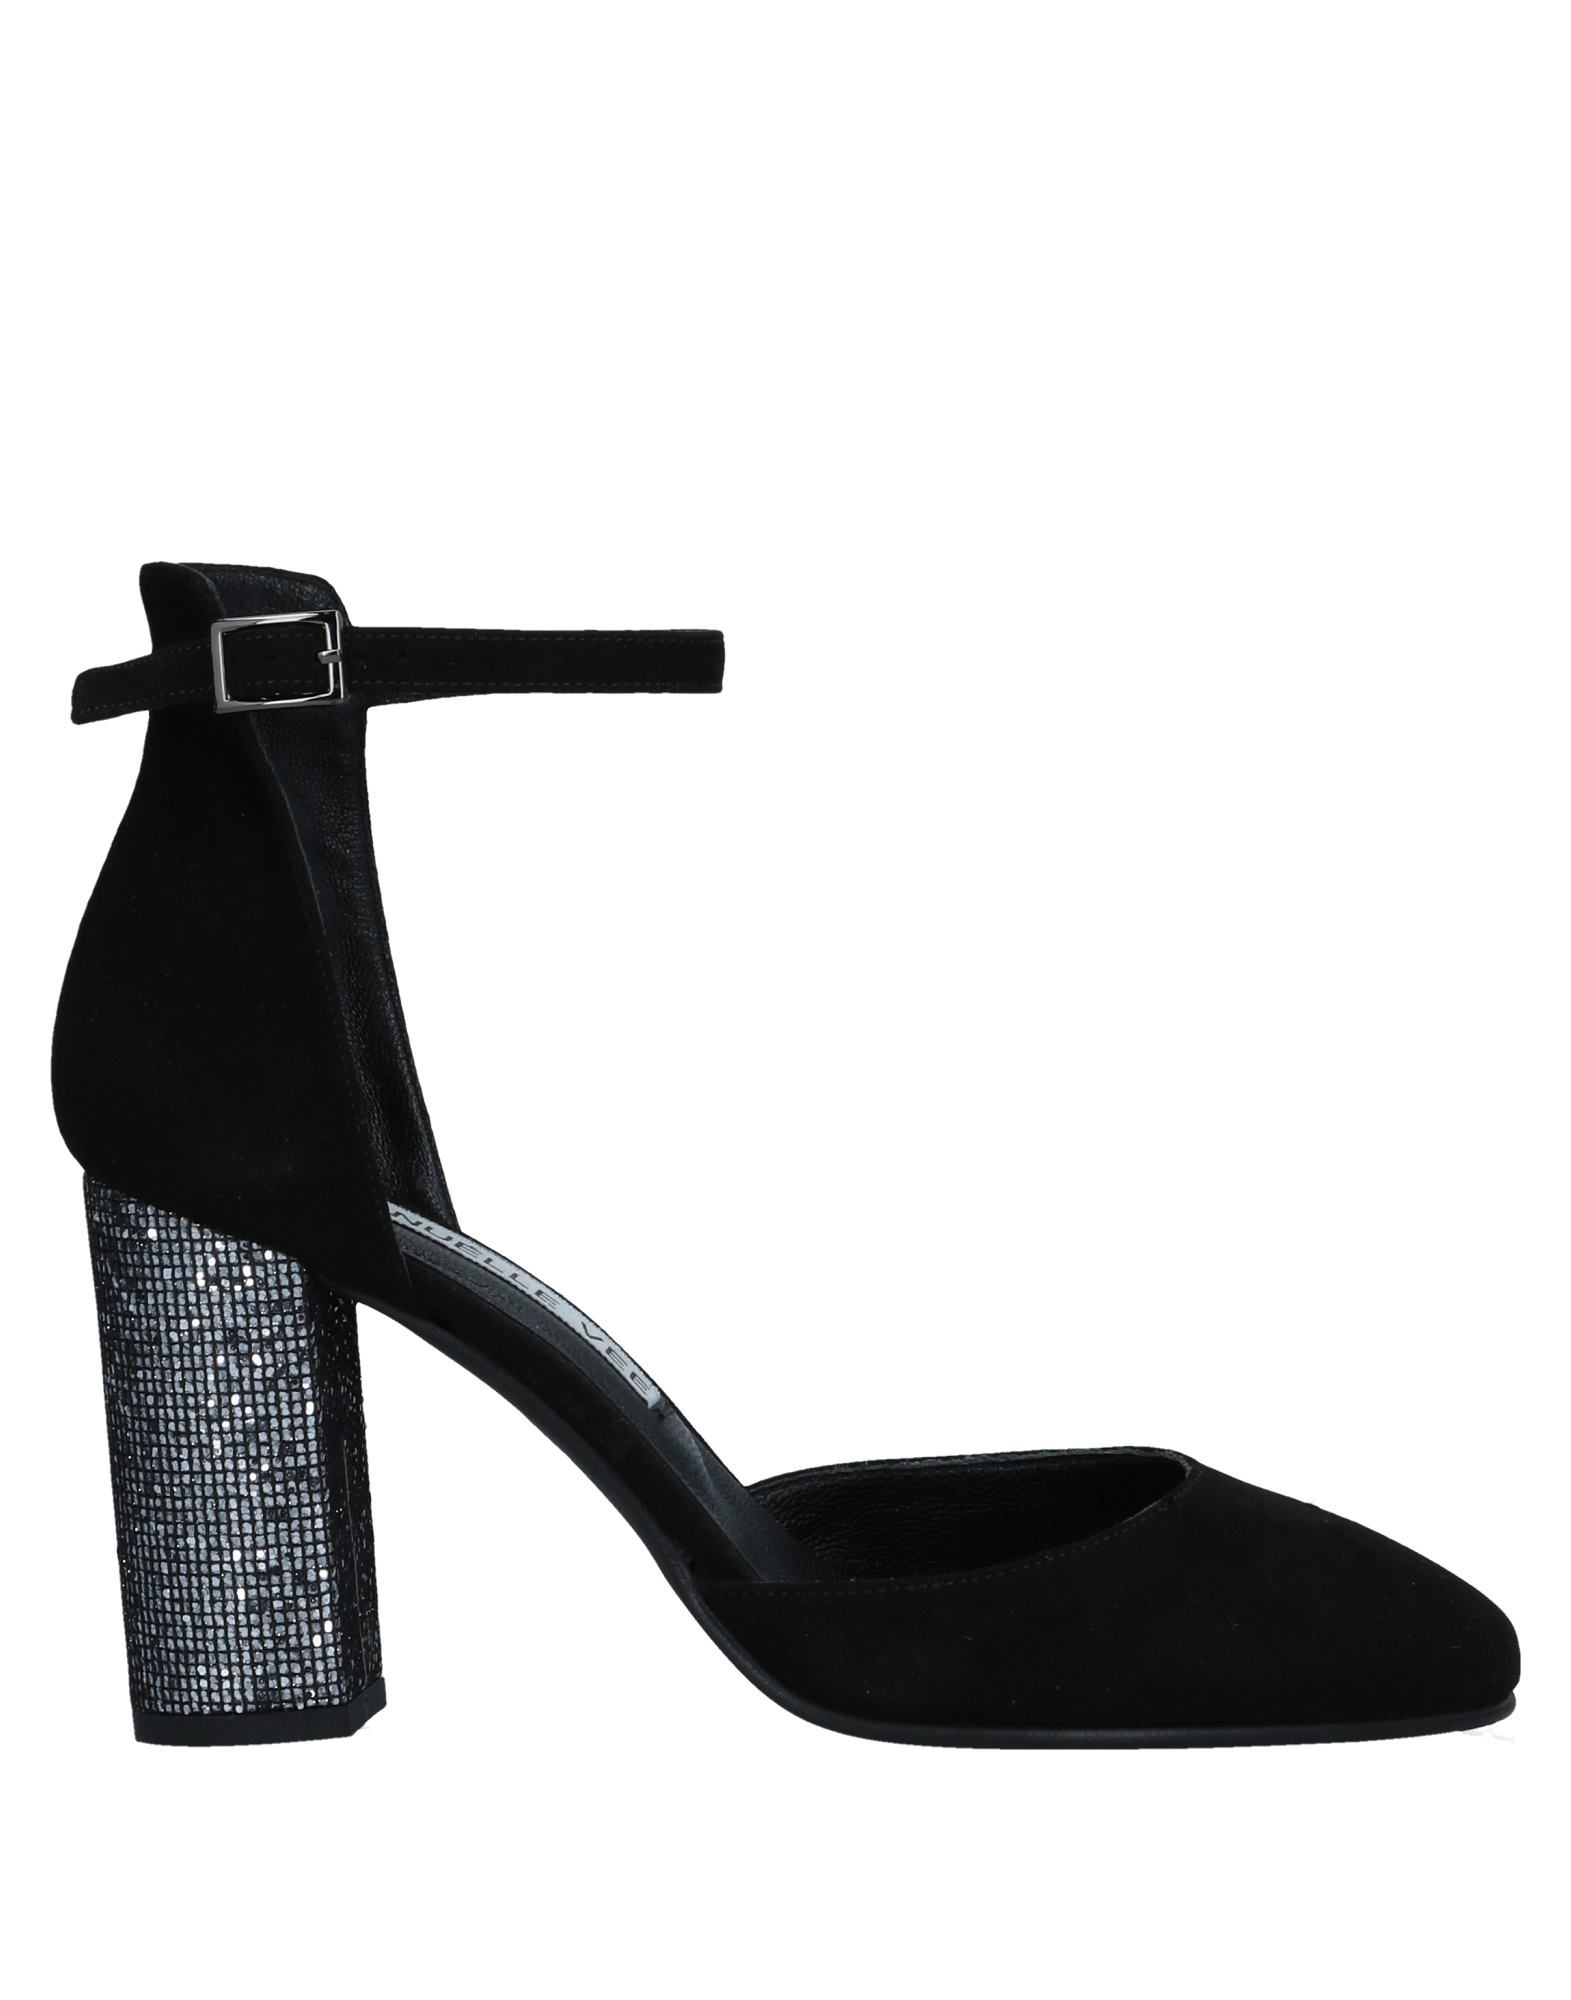 Emanuélle Vee Pumps Damen  11532878UG Gute Qualität beliebte Schuhe